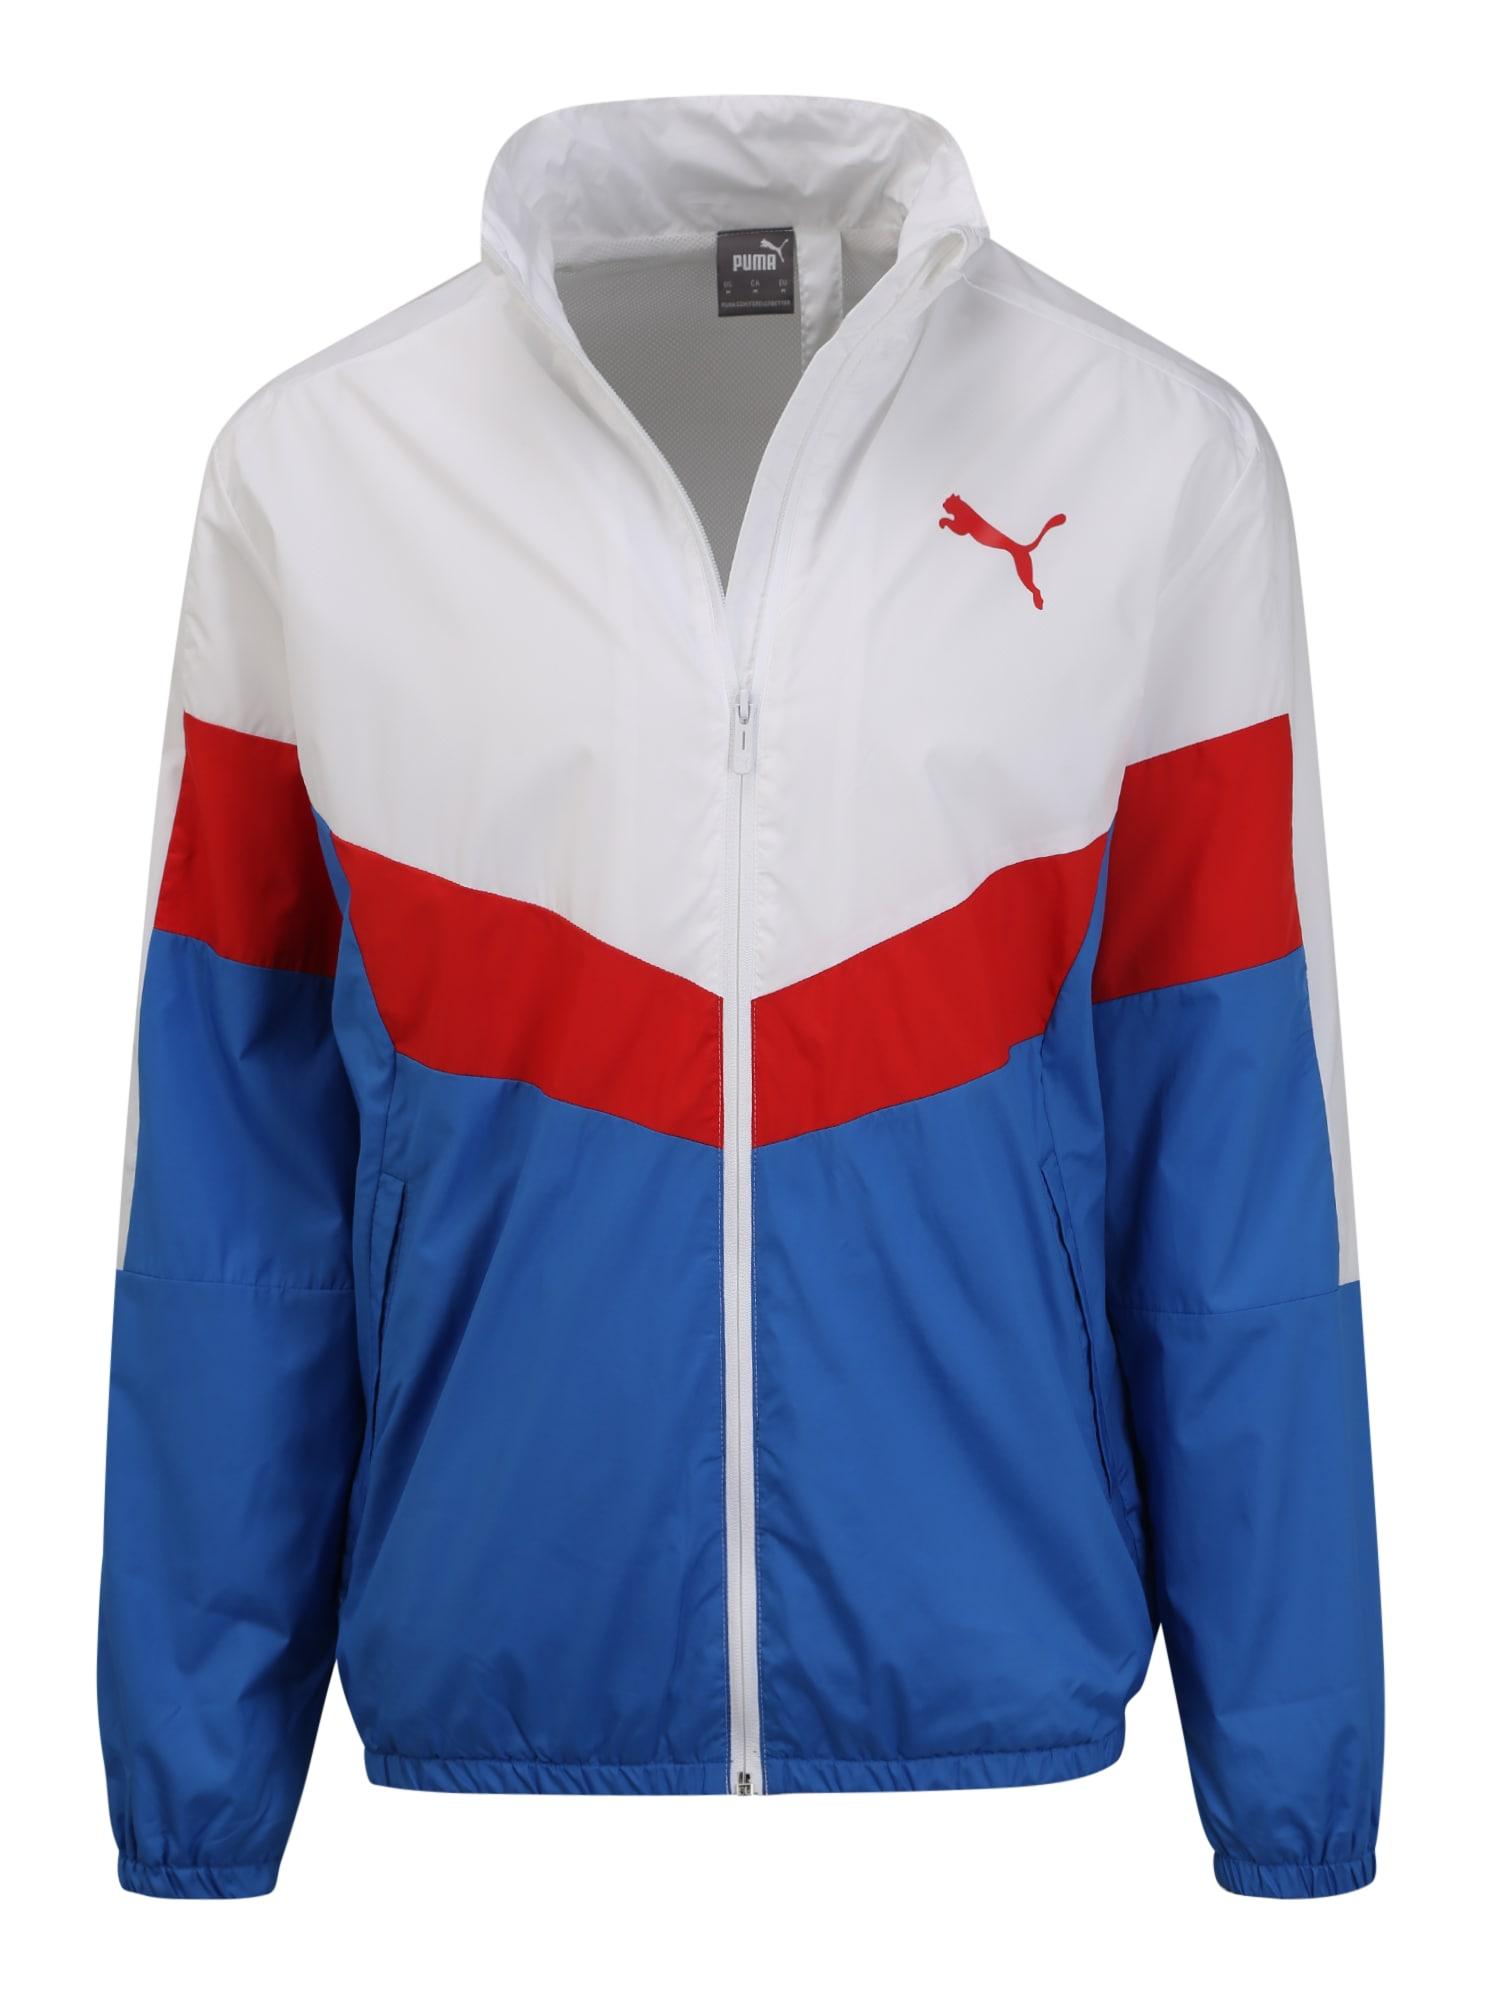 PUMA Džemperis treniruotėms mėlyna / balta / raudona